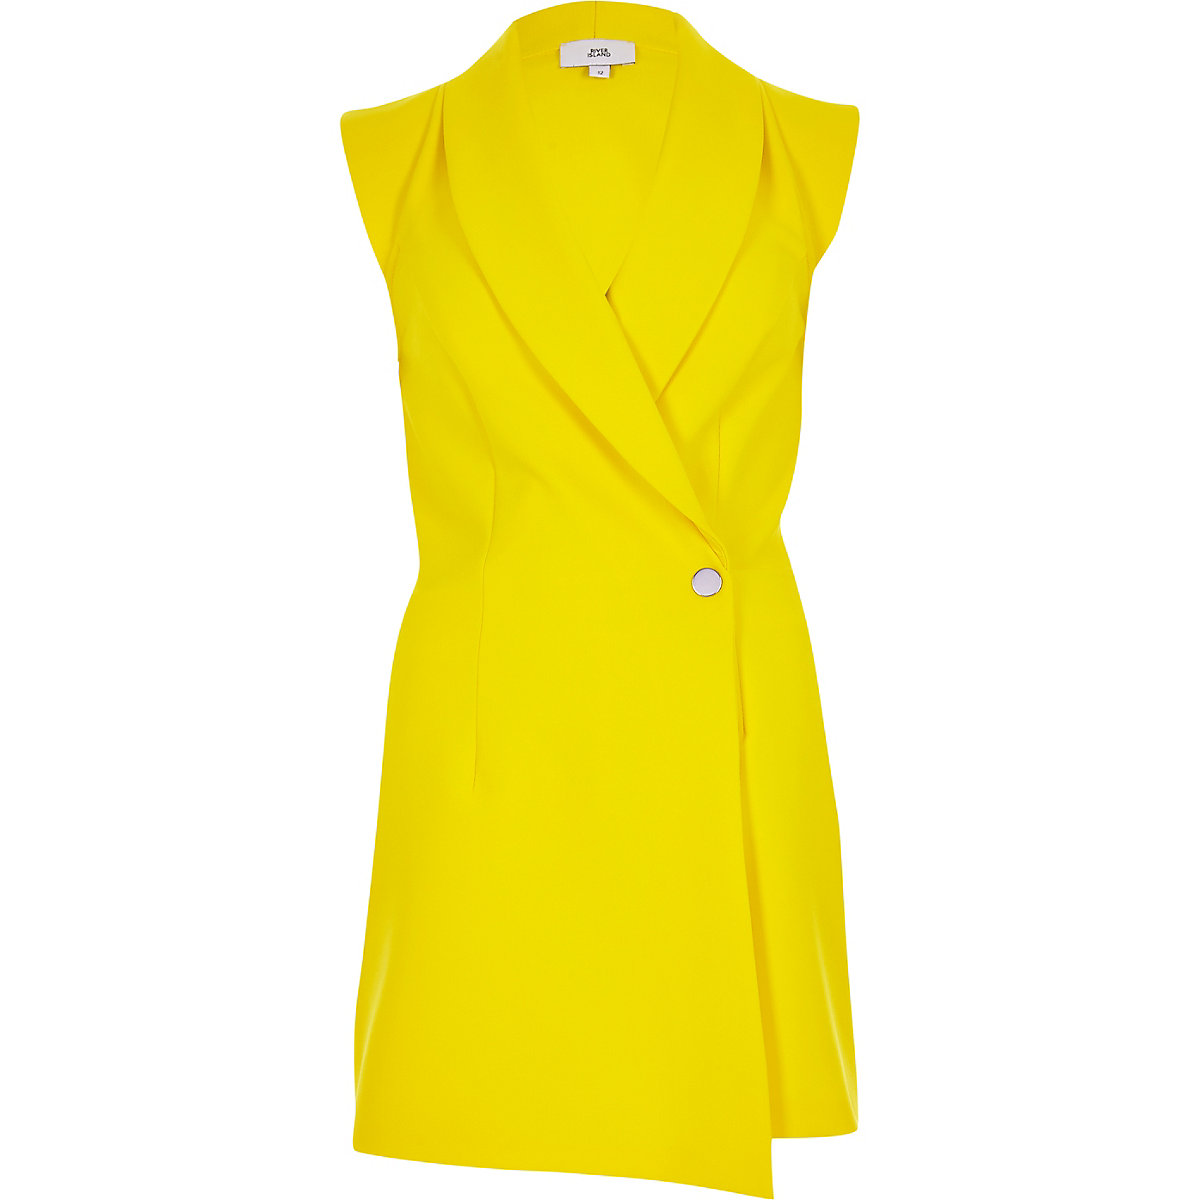 yellow playsuit